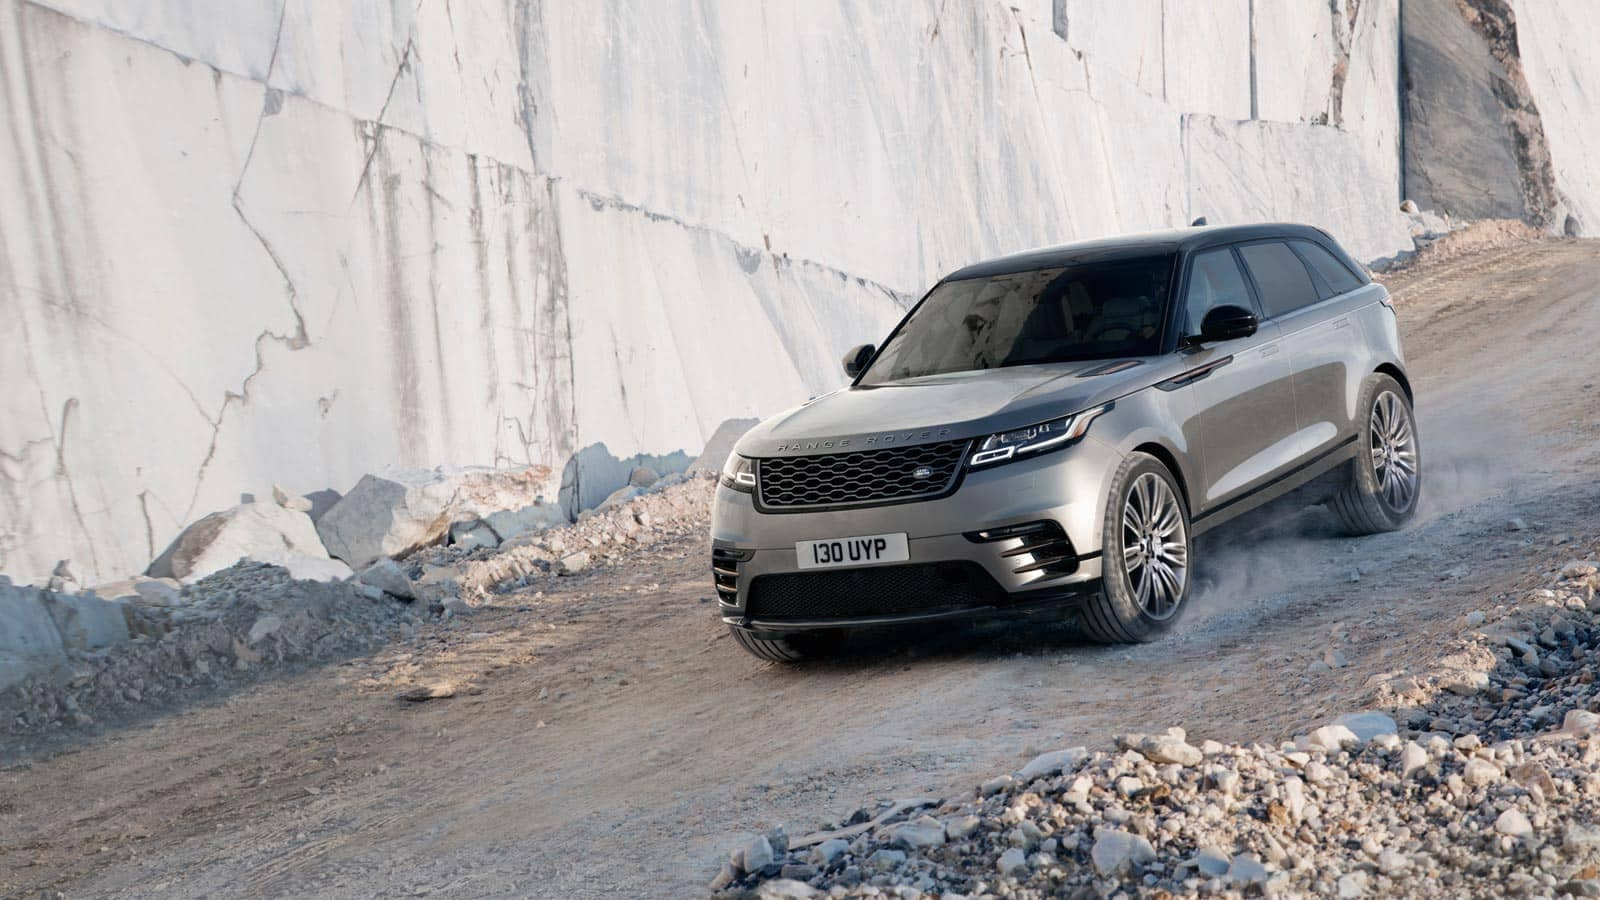 2019 Land Rover Range Rover Velar Off-Roading Down Rocky Mountain Hill